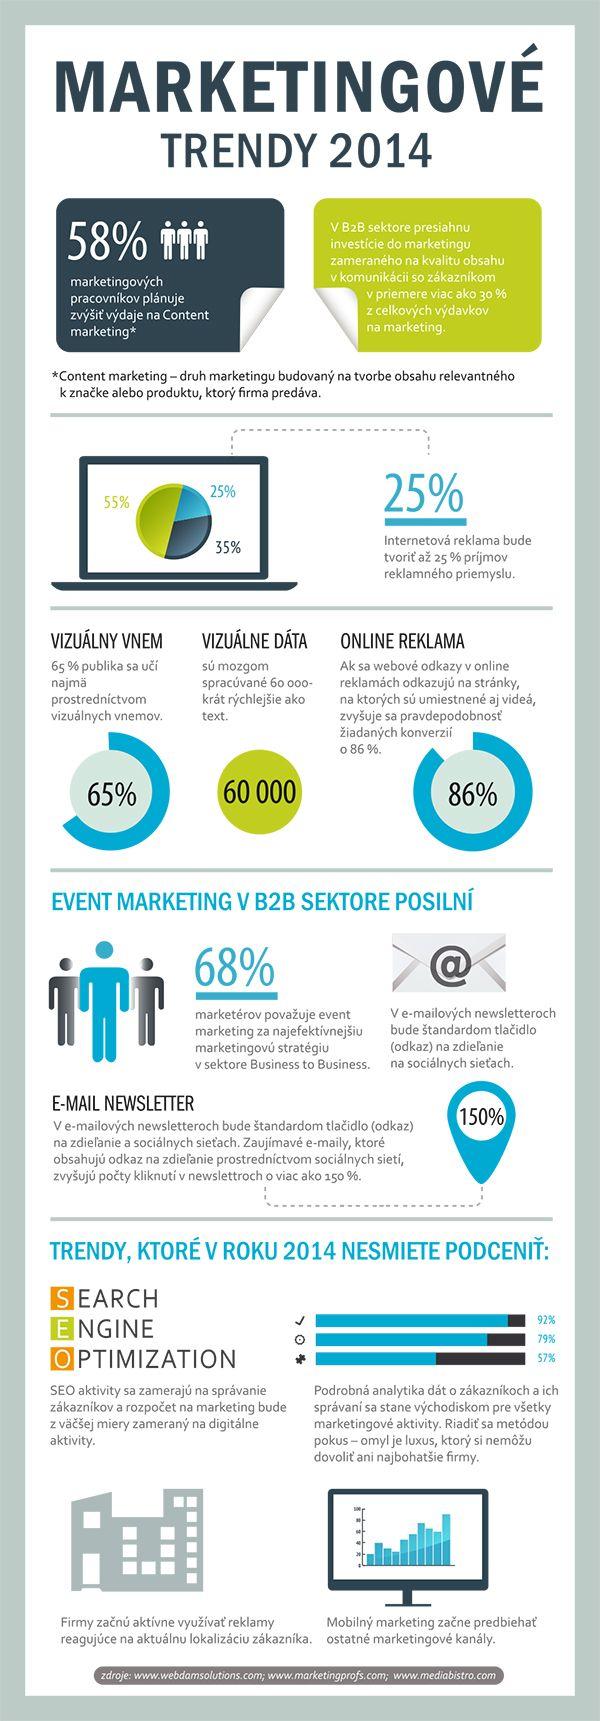 marketingove trendy 2014.jpg